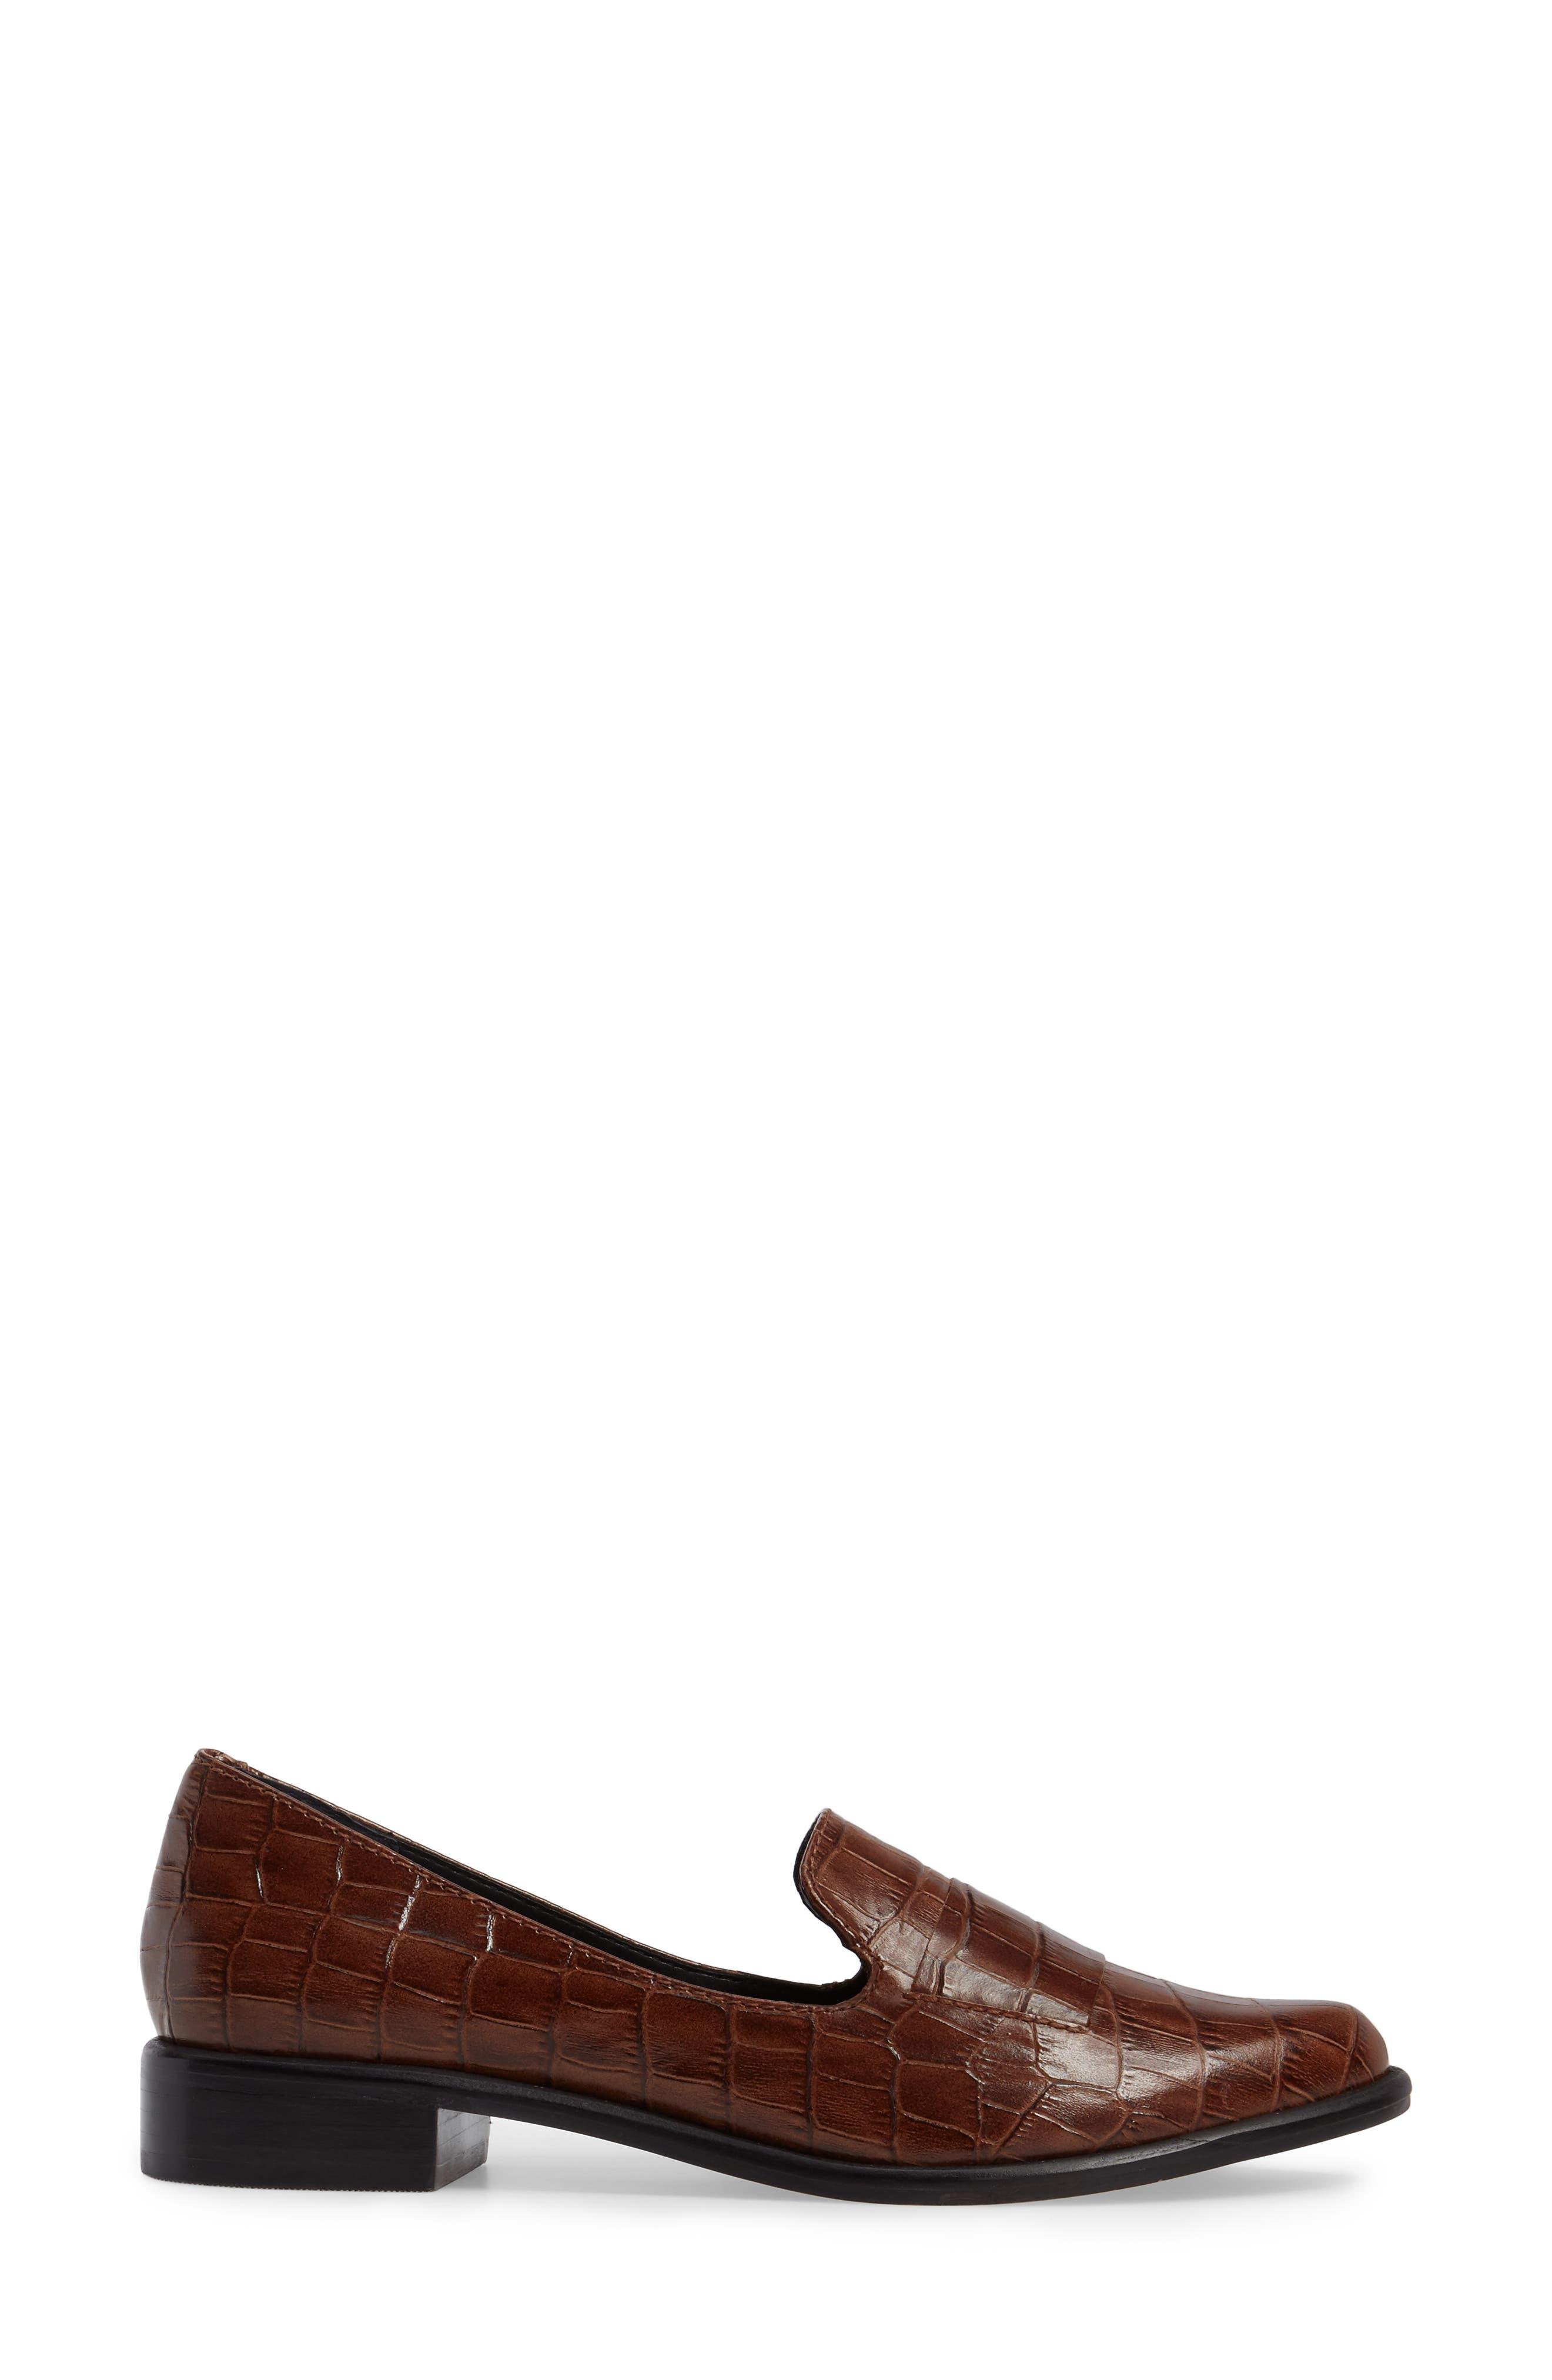 M4D3 'Ocean' Flat Loafer,                             Alternate thumbnail 16, color,